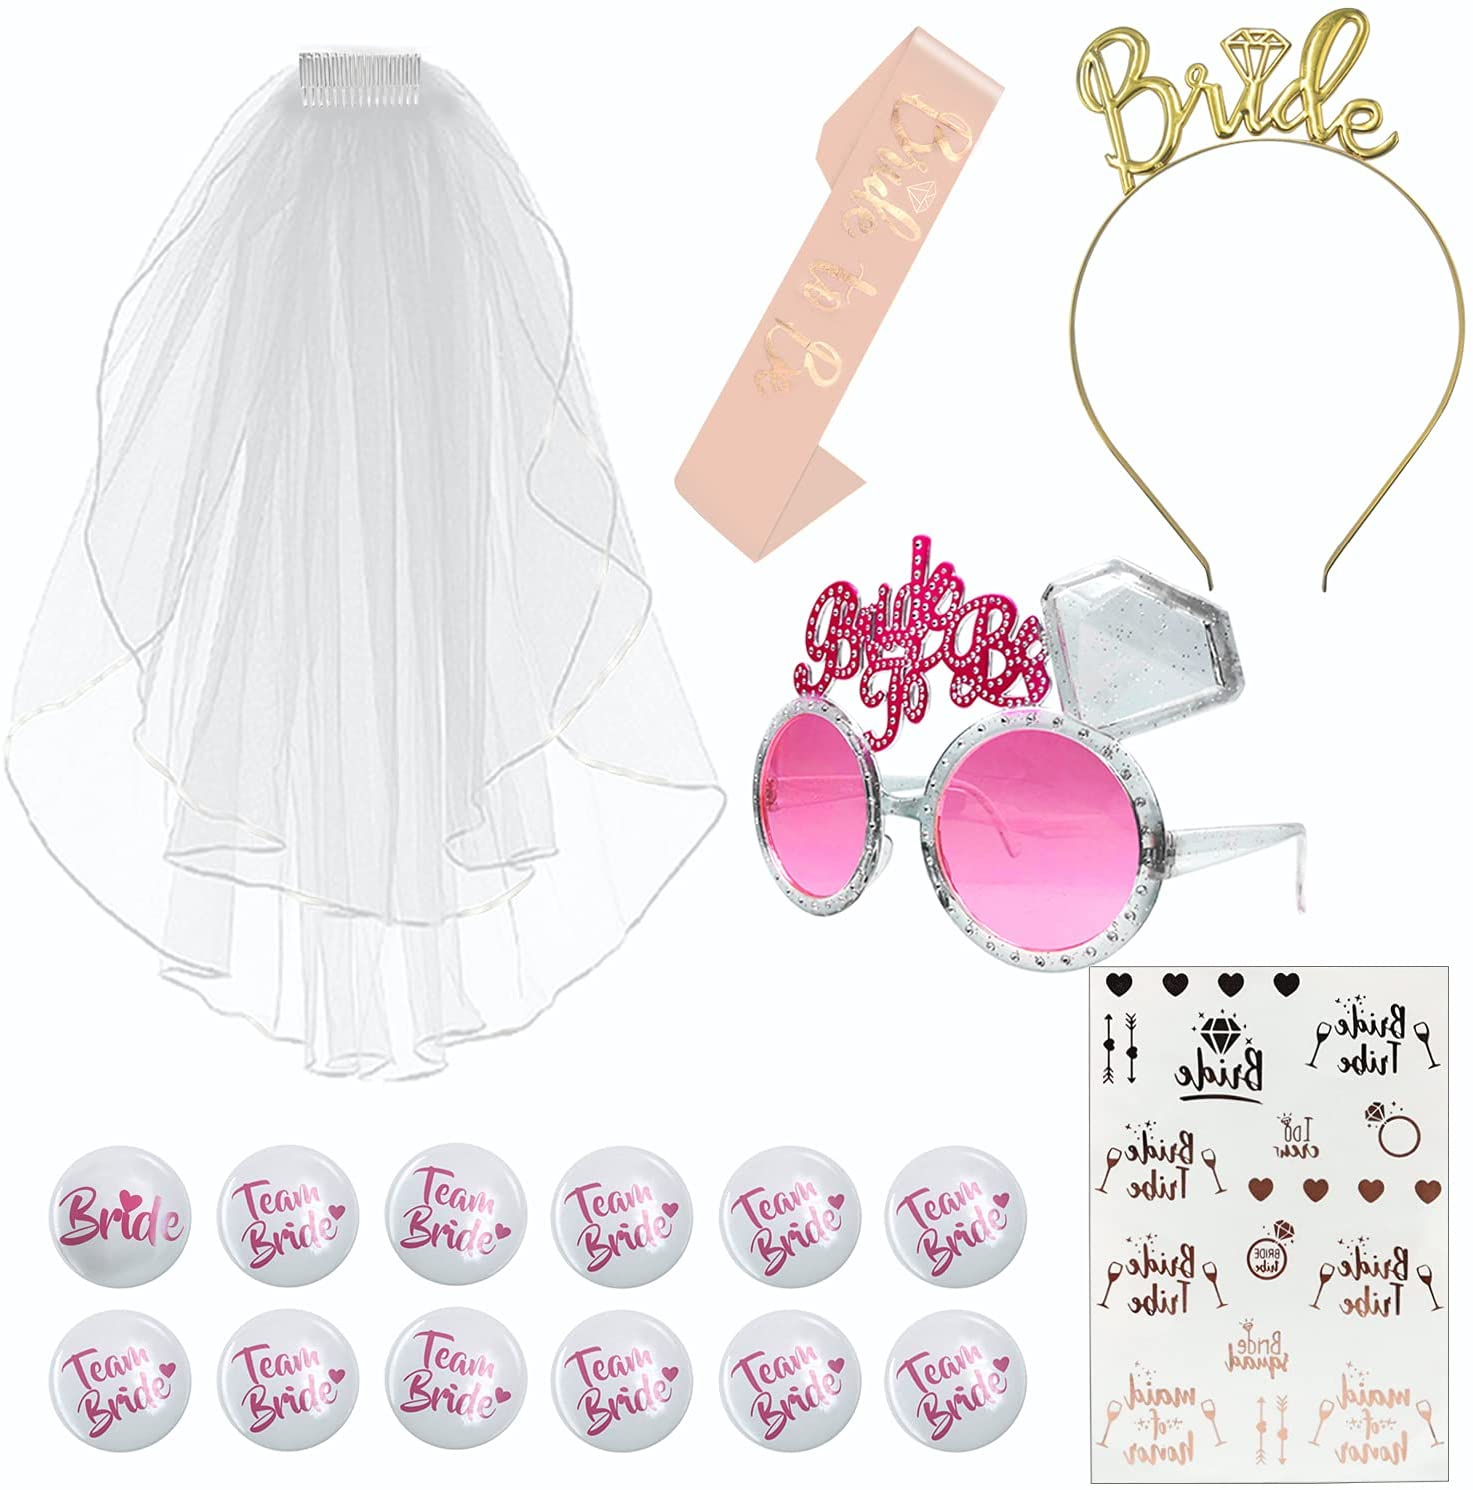 Bridal veil with headband, glasses and tattoo